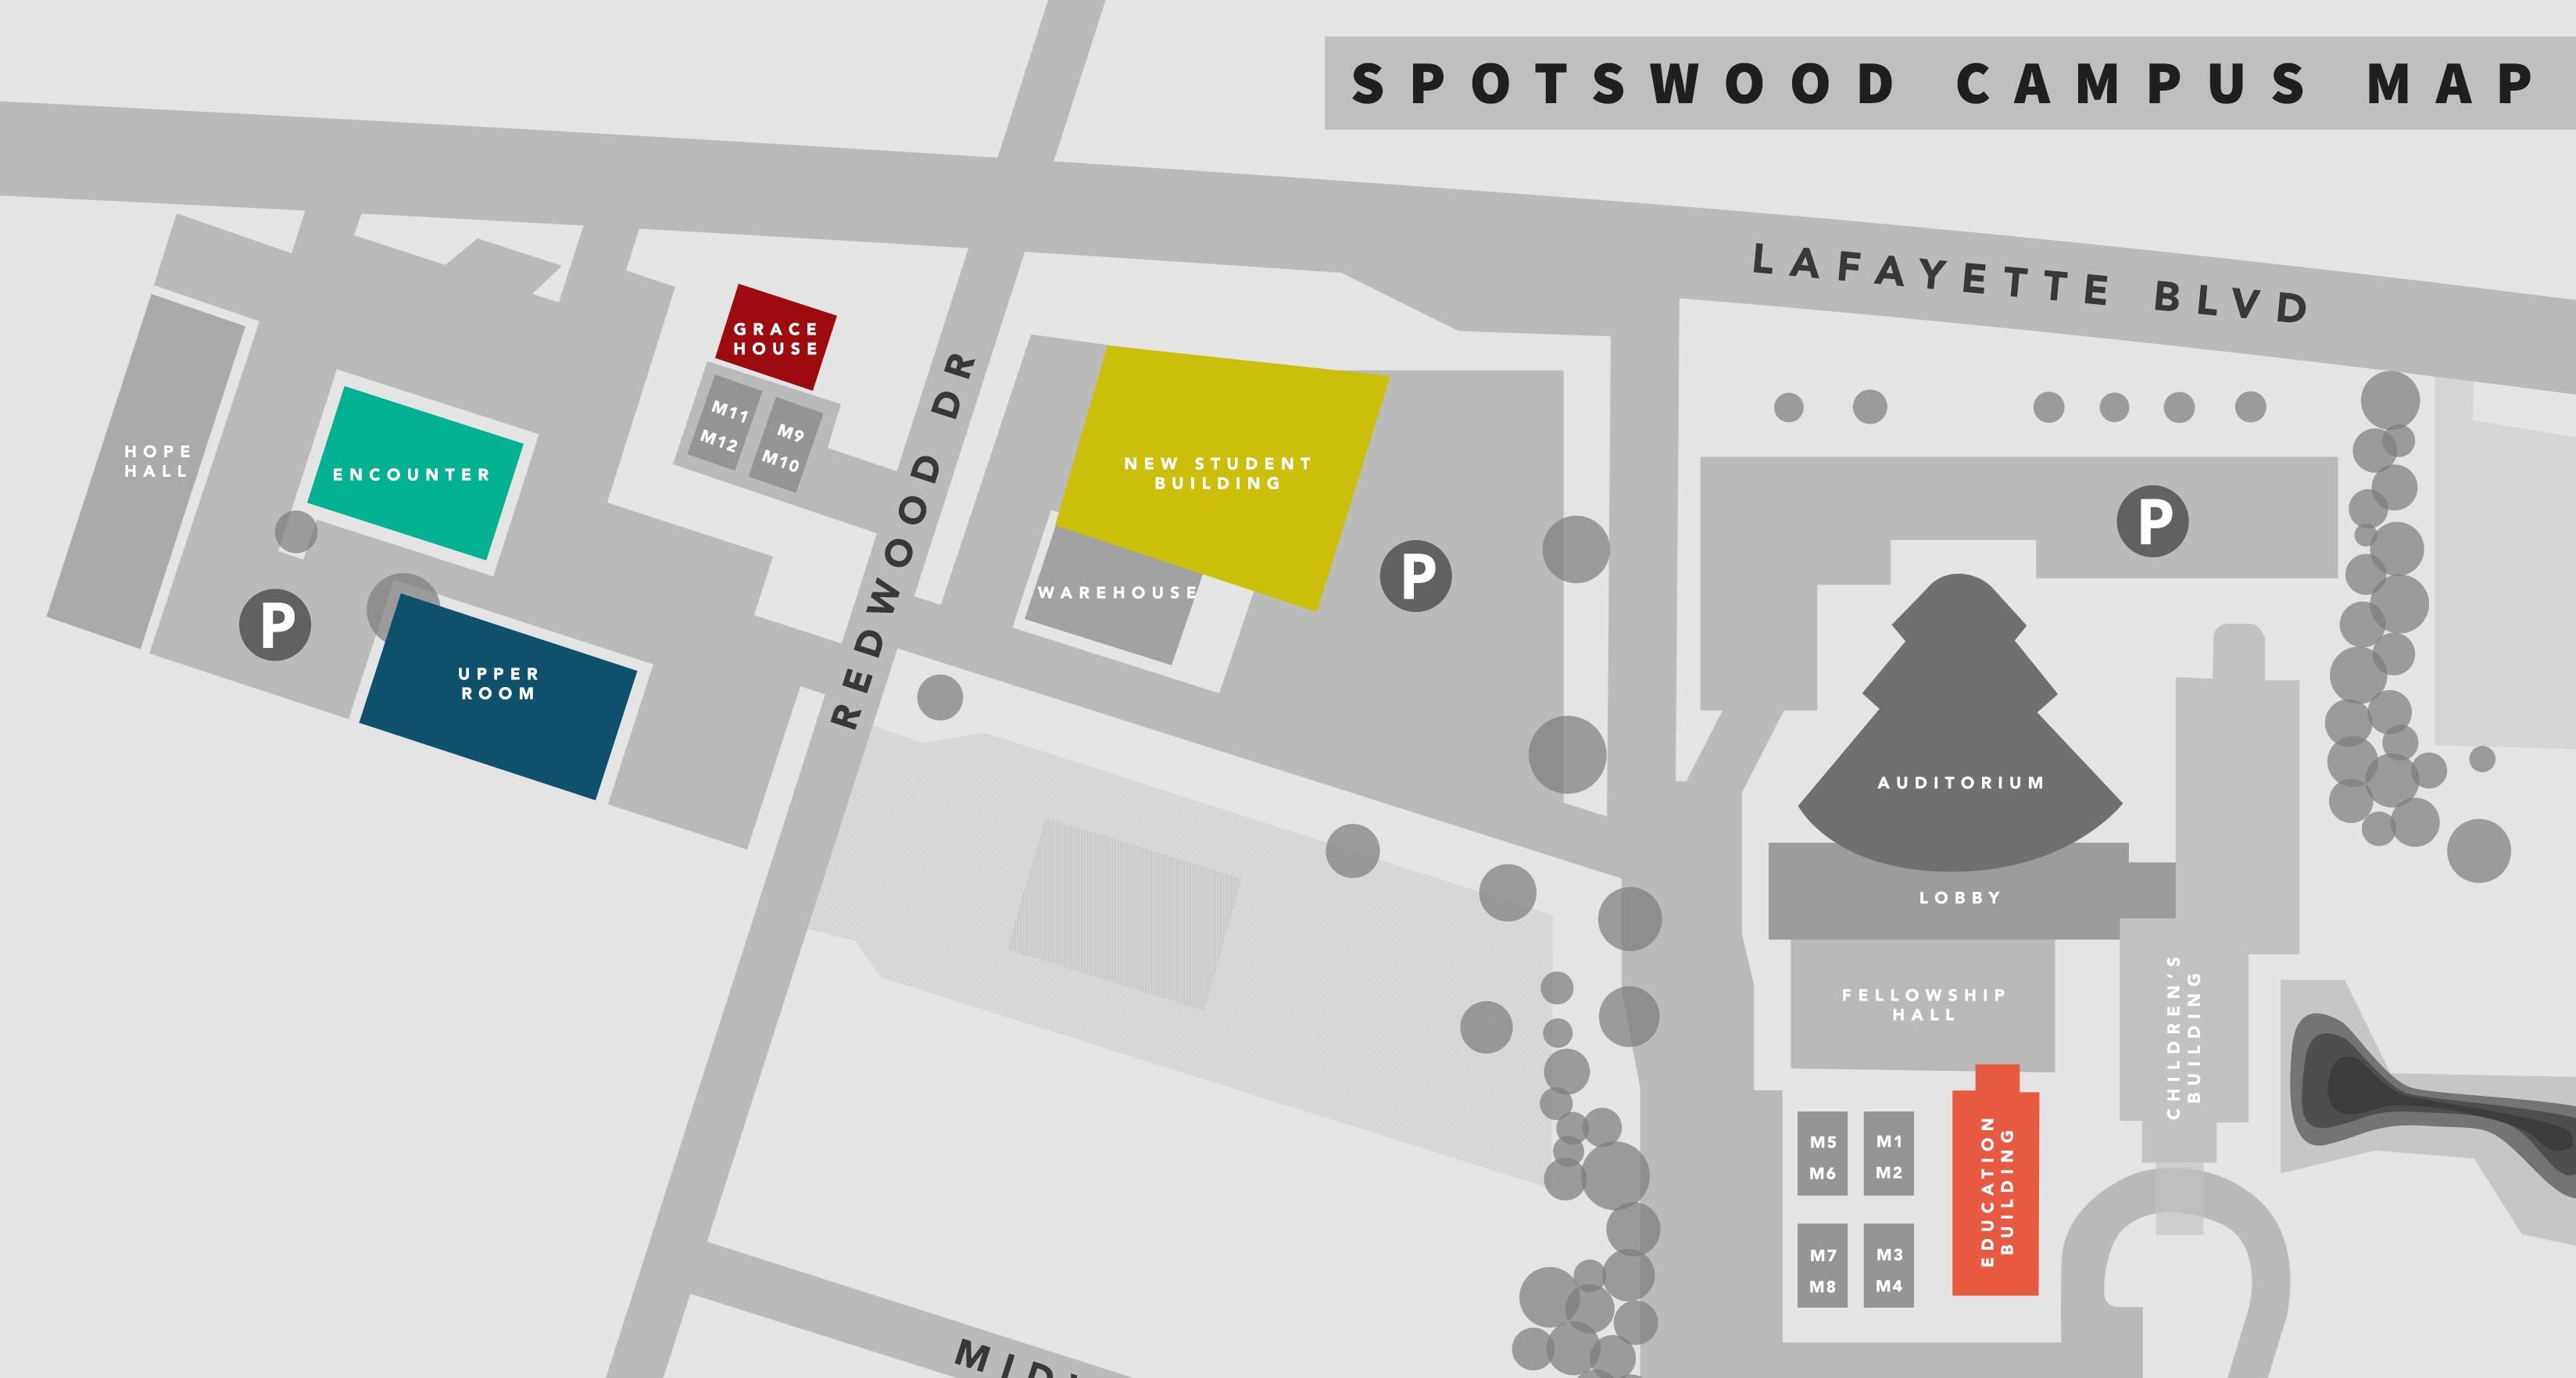 Spotswood Campus Map